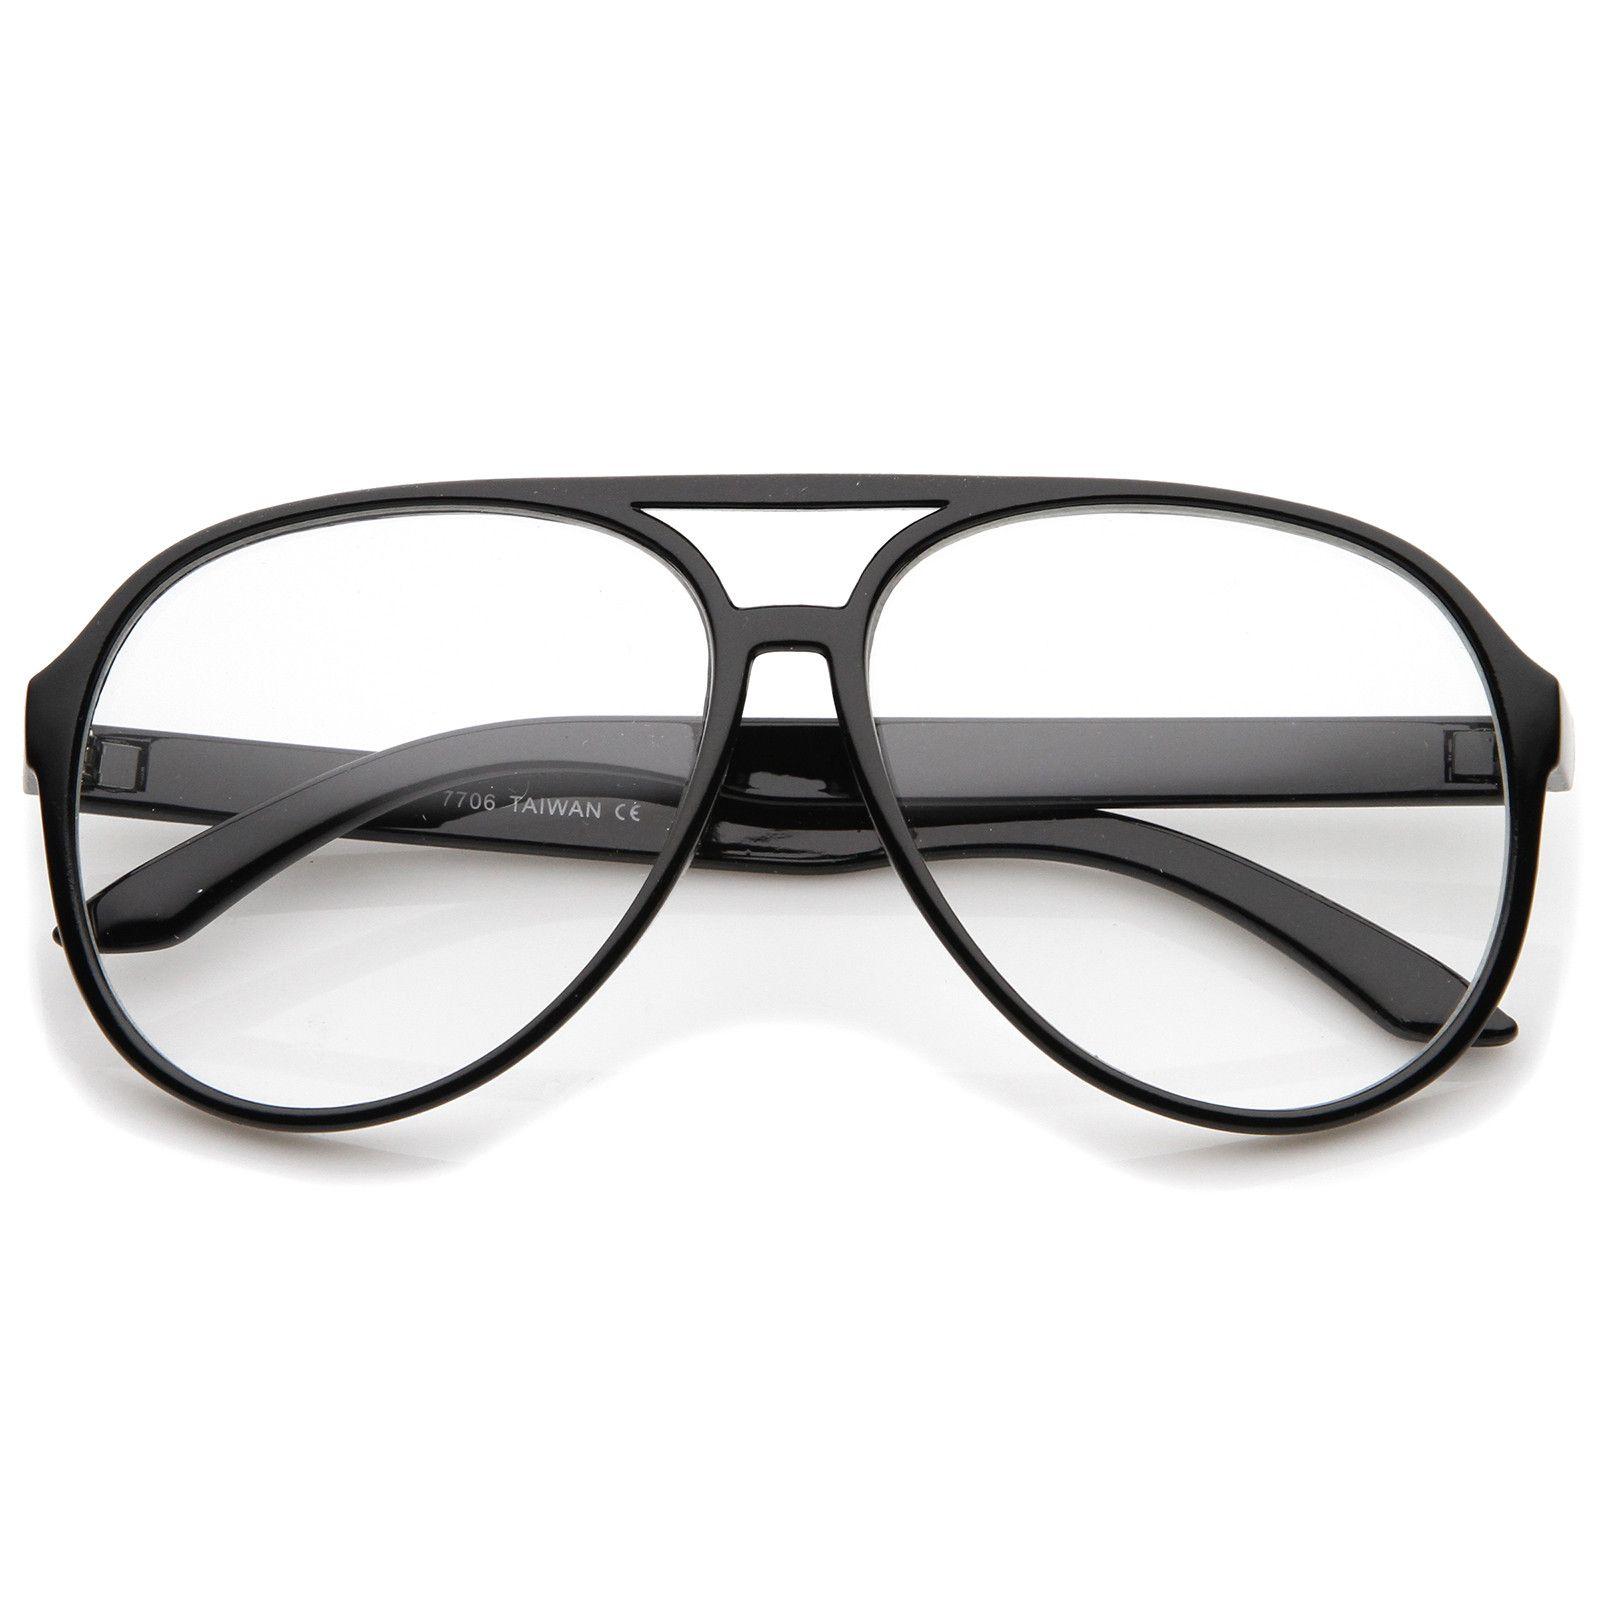 bad6d7a223f1 Retro Flat Top Teardrop Shaped Clear Lens Aviator Sunglasses 59mm # sunglasses #clear #bold #frame #sunglass #oversized #cateye #sunglassla  #mirrored #womens